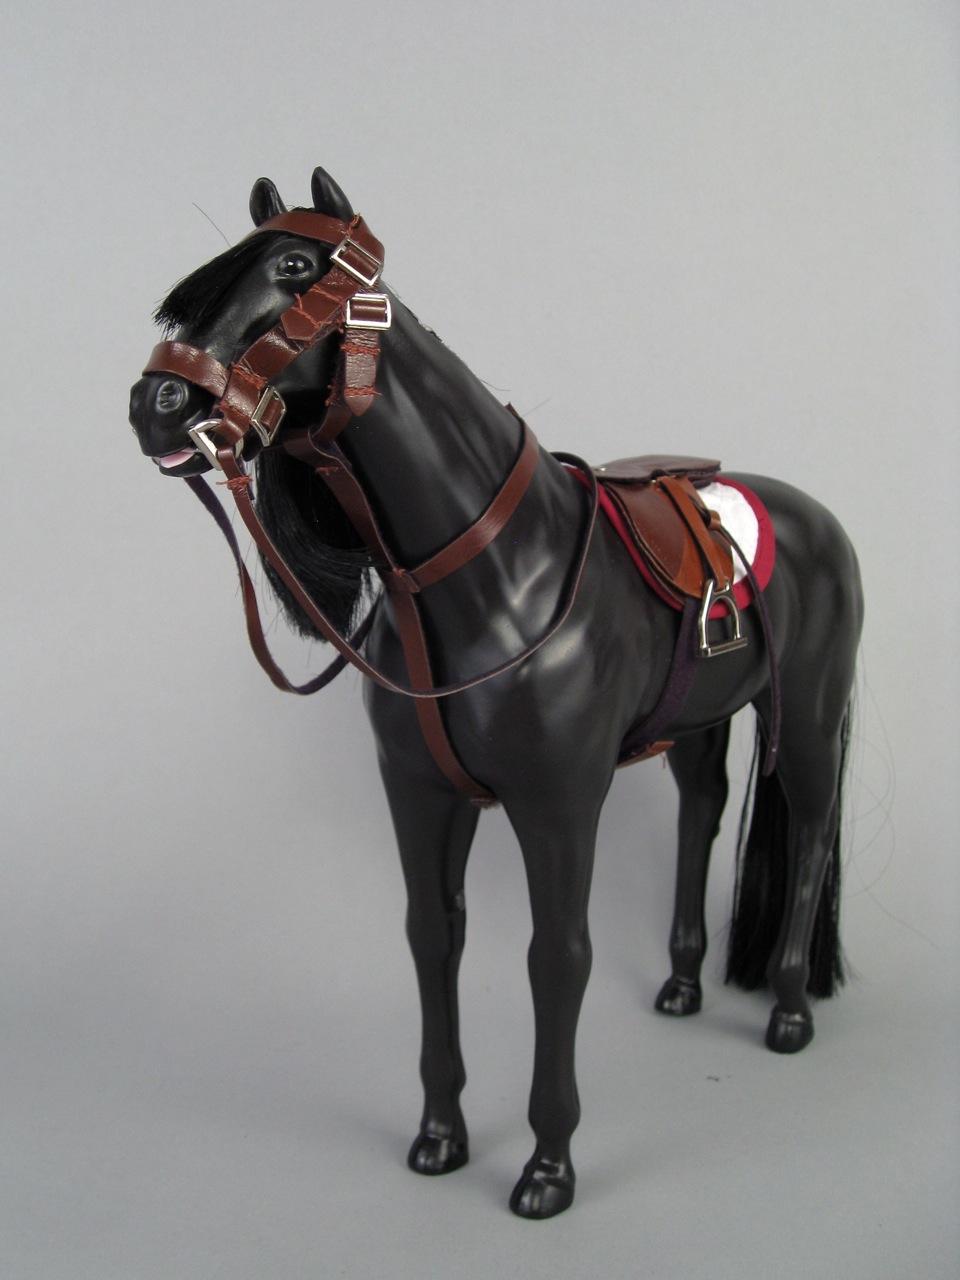 Paradise horse and tack